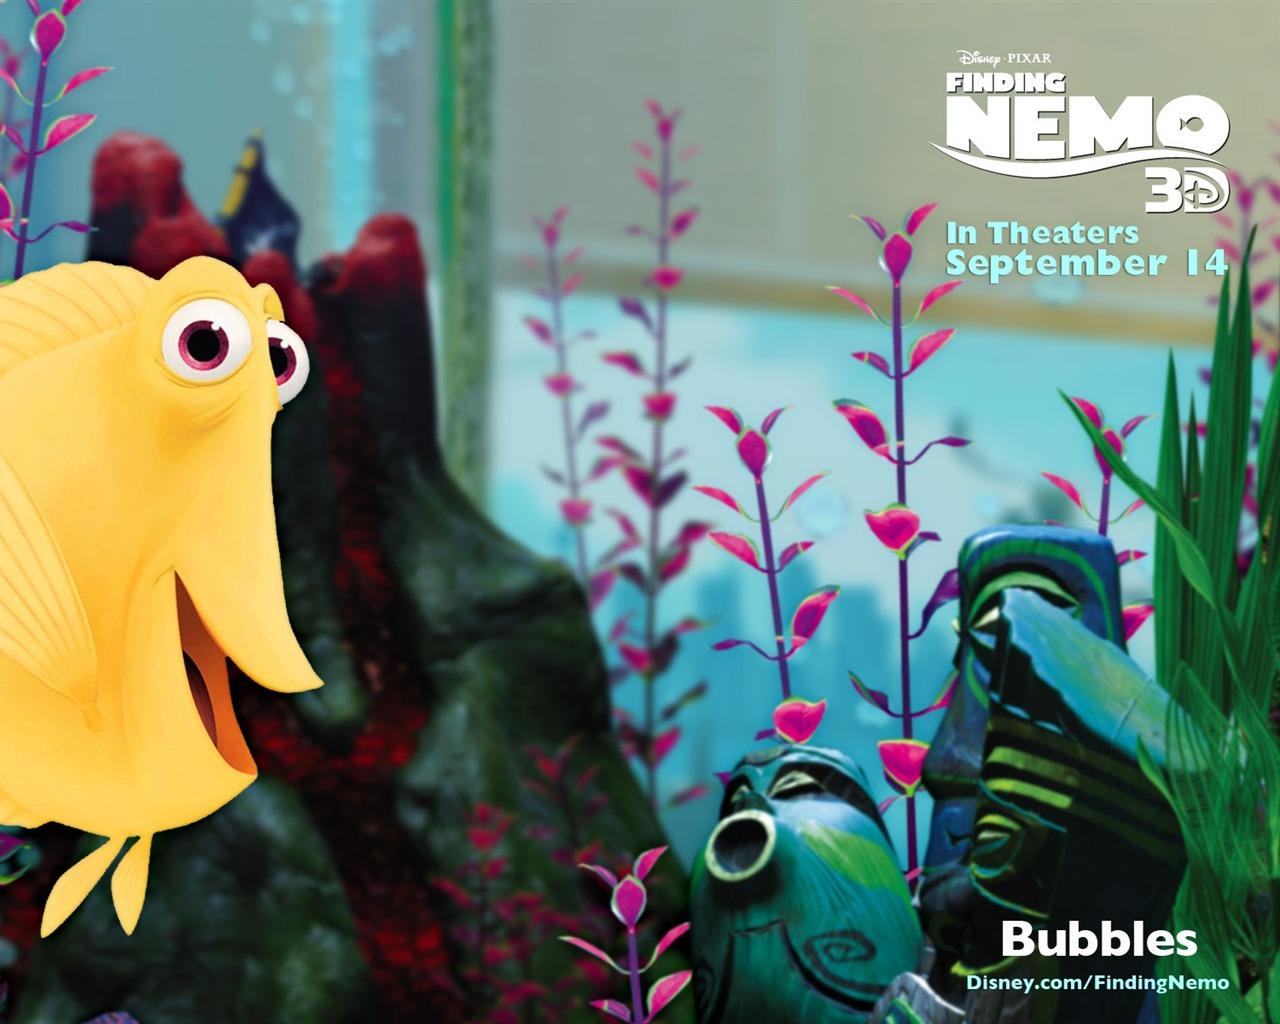 Finding Nemo D Animasi Hd Wallpaper: Bubbles-Finding Nemo 3D 海底总动员 3D 2012电影HD桌面壁纸预览